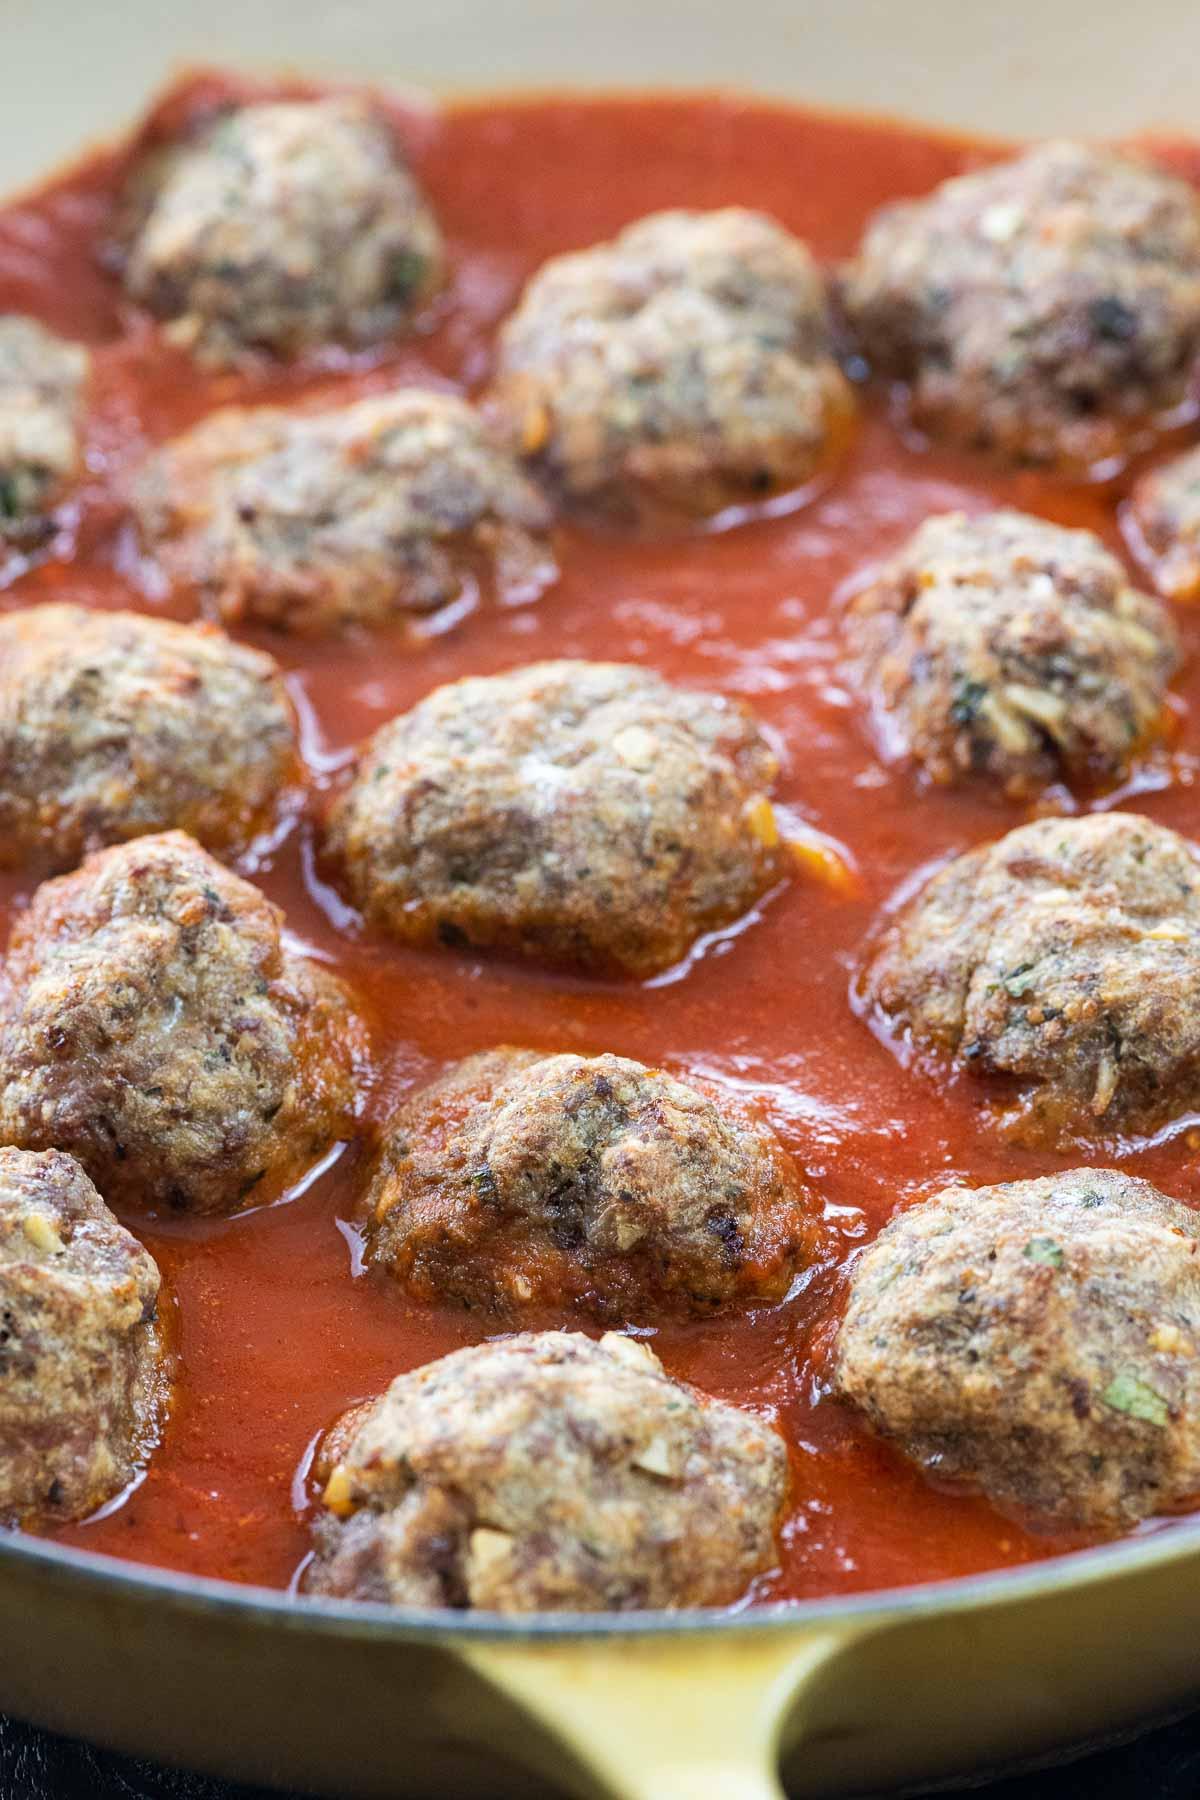 Grandma's Italian meatballs with tomato sauce in a pan